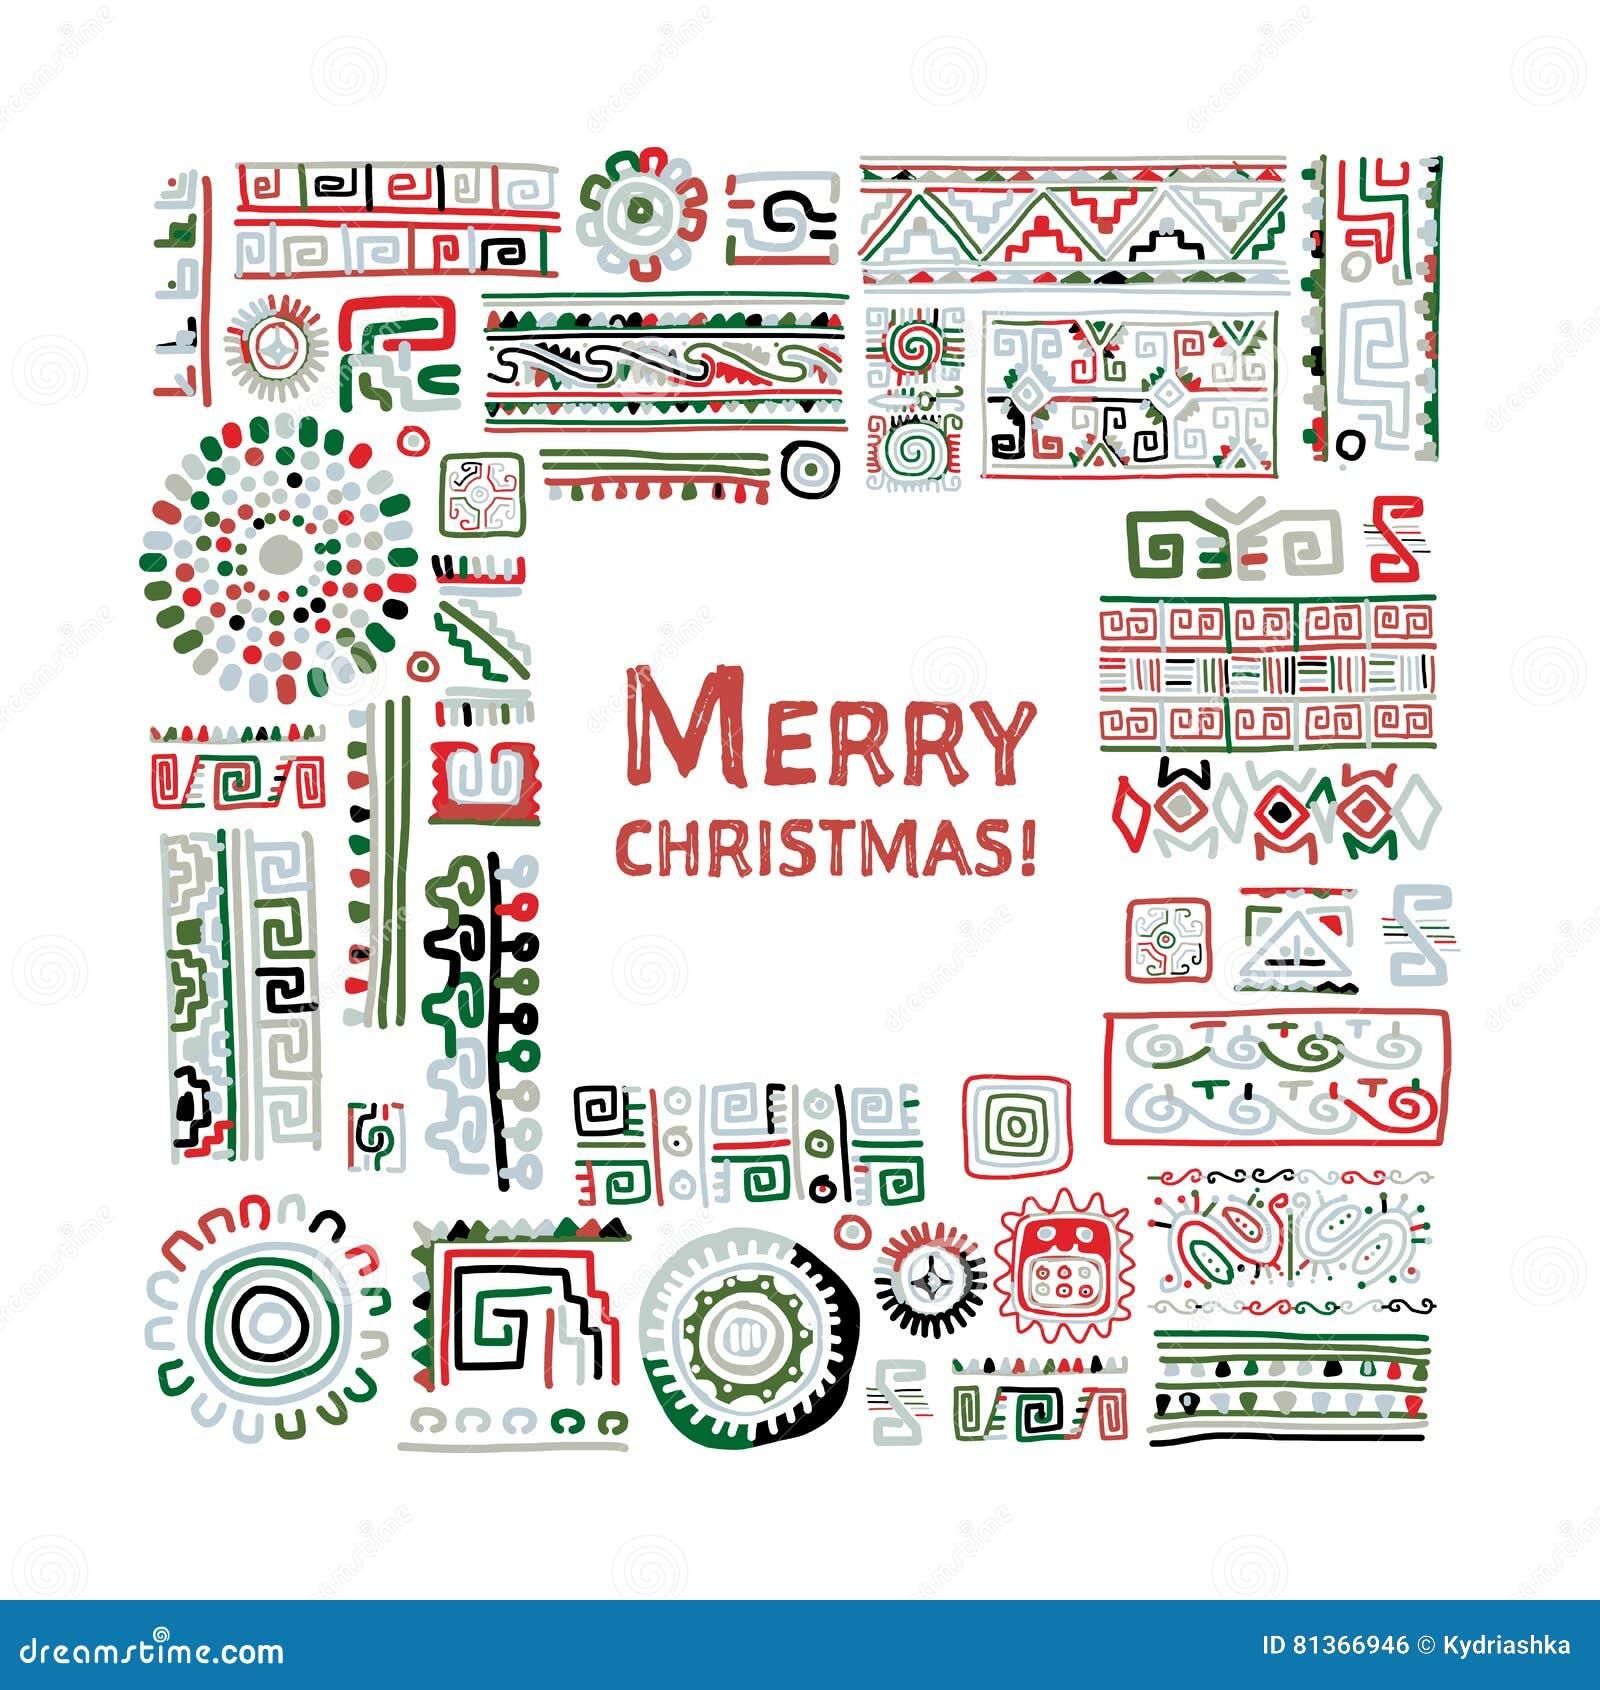 Merry Christmas! Ethnic handmade ornament for your design